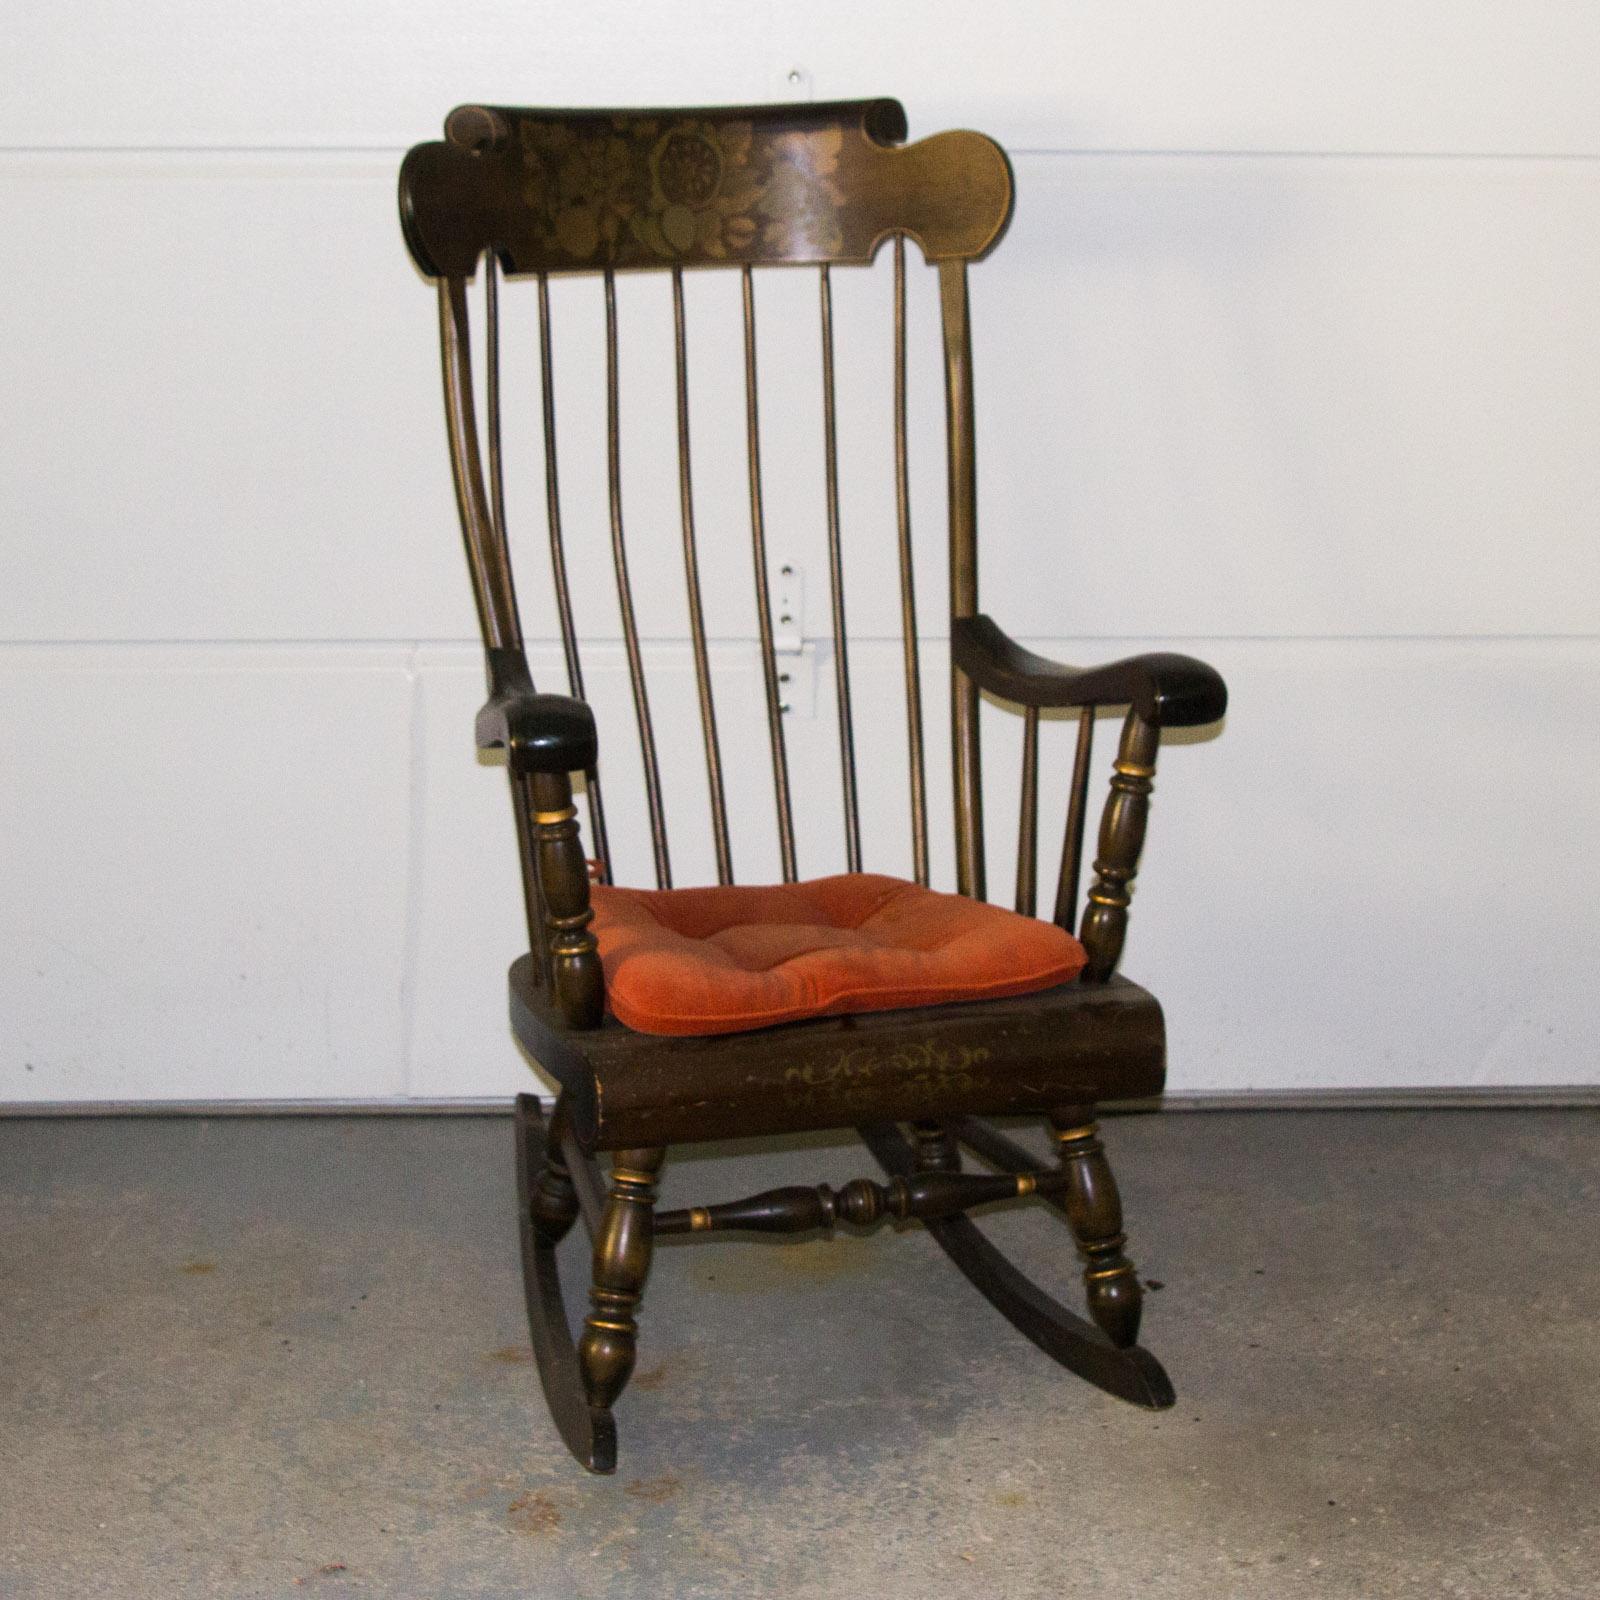 wooden rocking chair. Vintage Wooden Rocking Chair